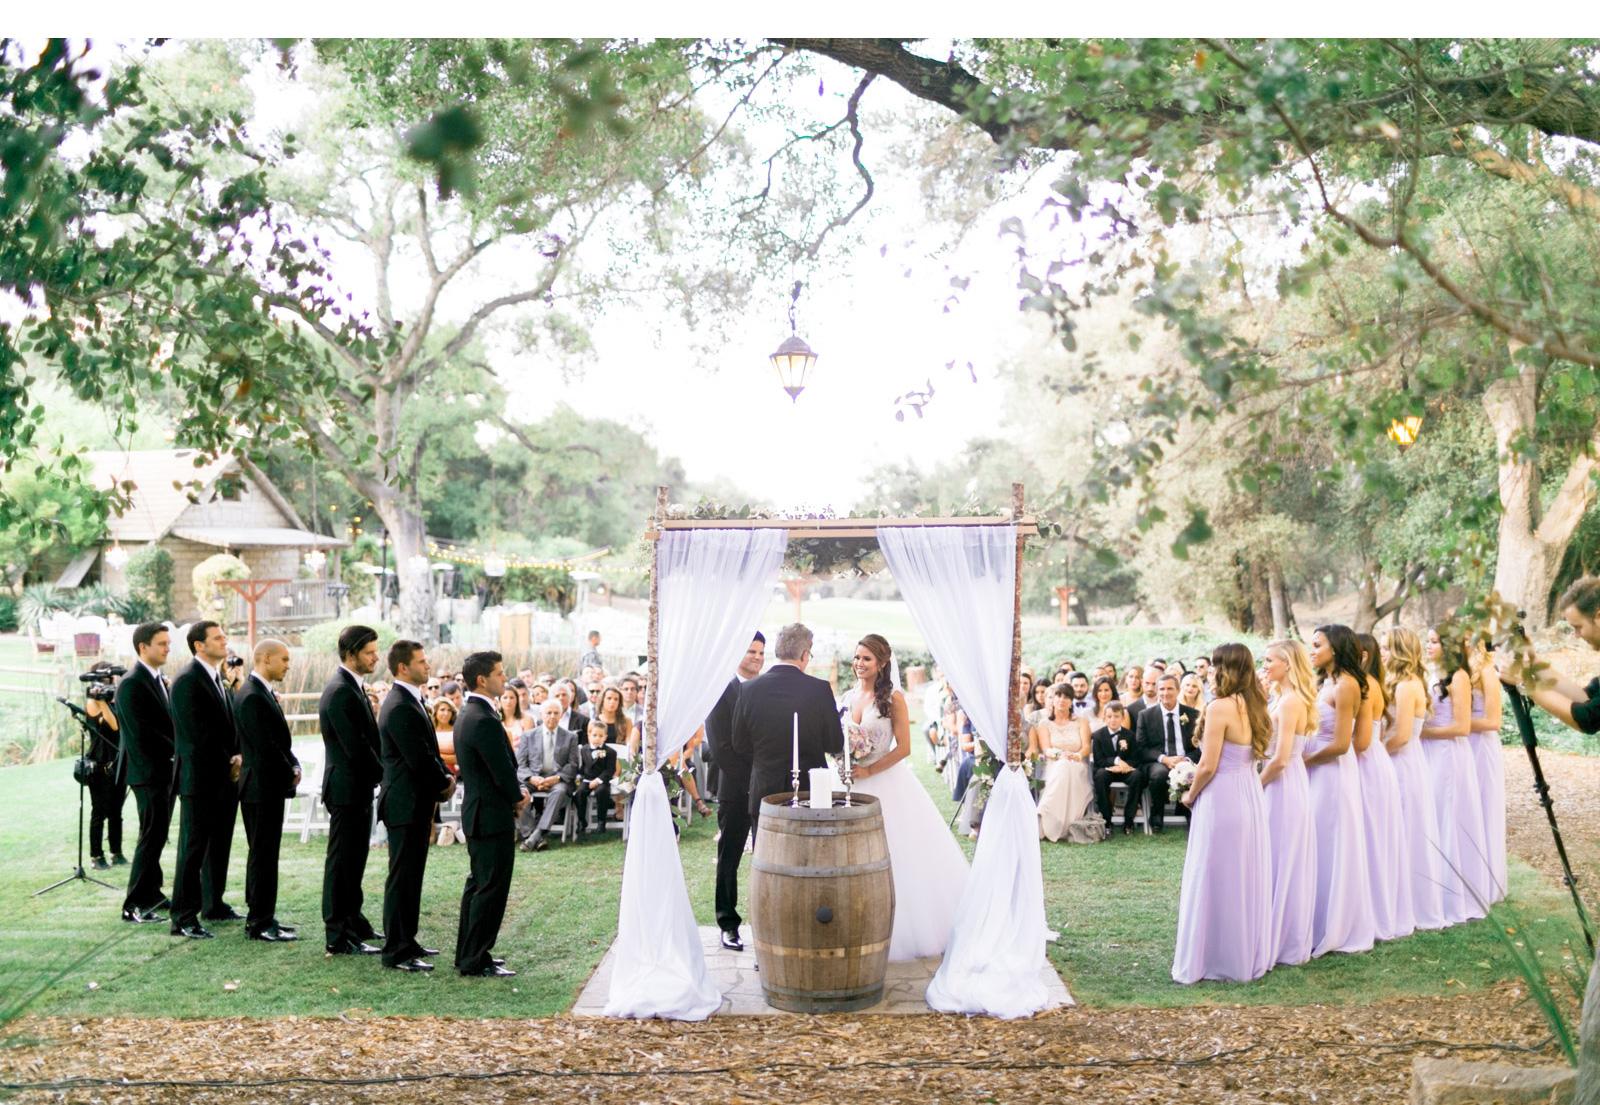 Nia-Sanchez-Miss-USA-Temecula-Wedding-Natalie-Schutt-Photography_03.jpg